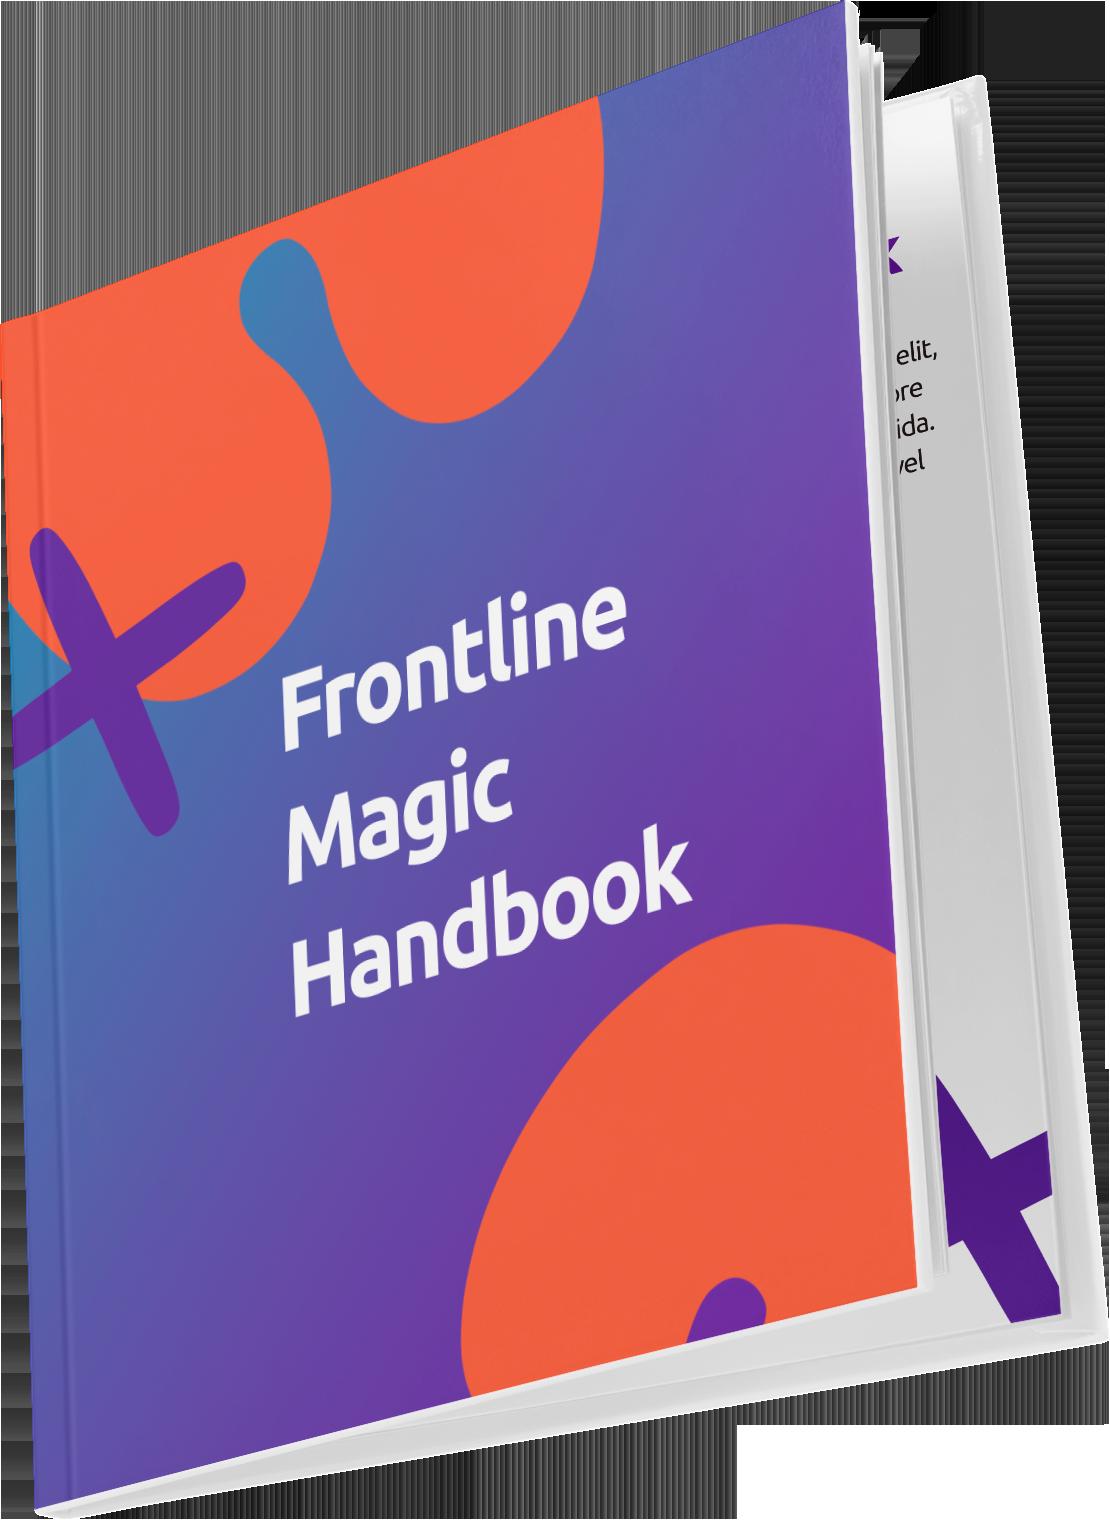 Frontline Magic Handbook Cover